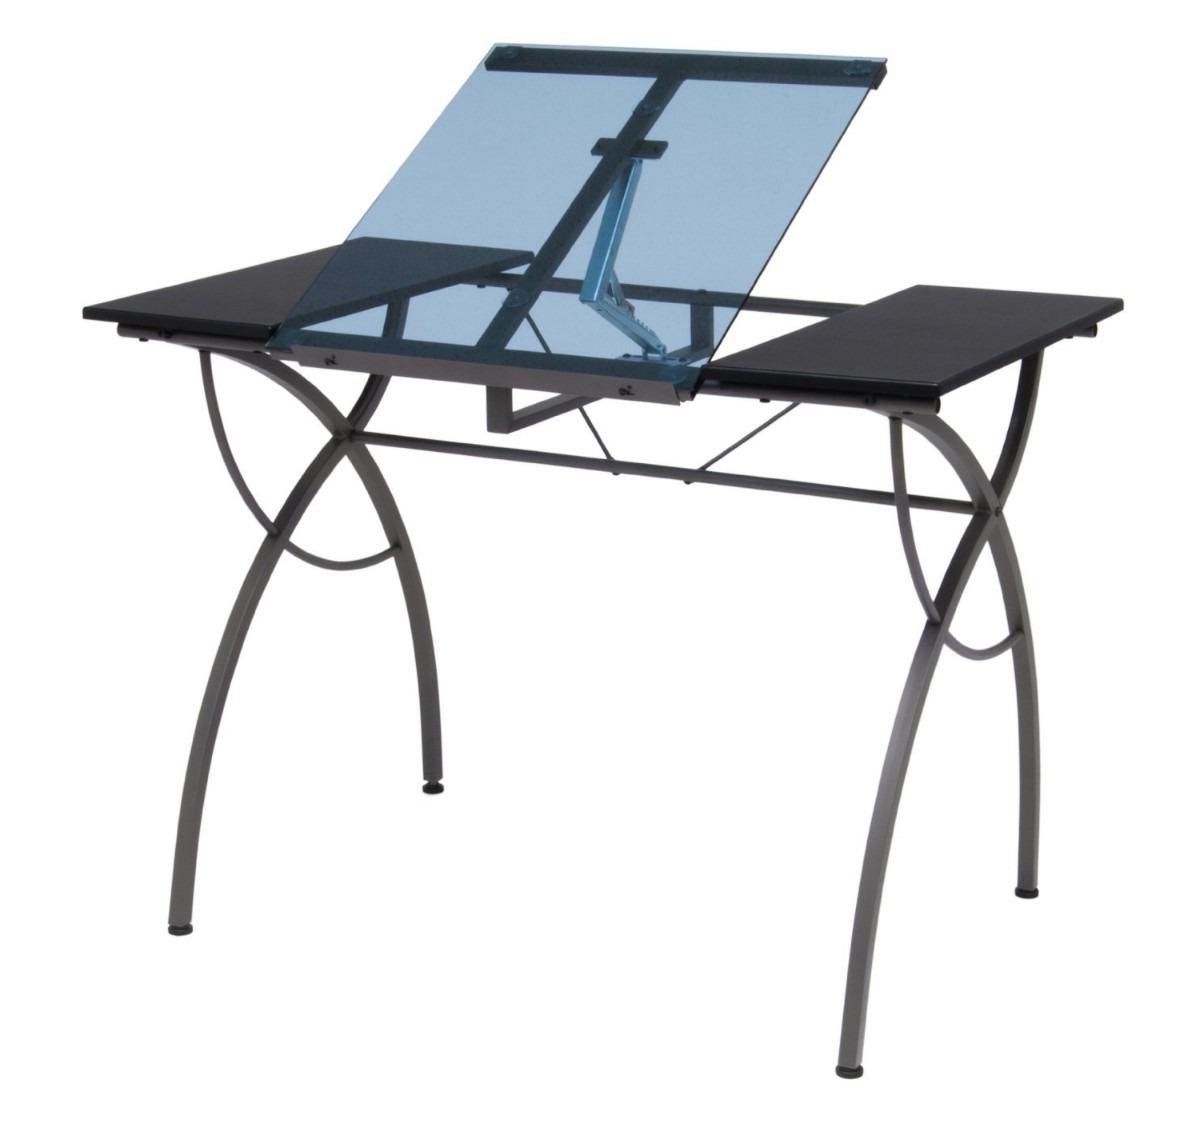 Mesa Para Dibujar Drdp Mesa Para Dibujo Cristal Escritorio Dibujar Ajustable Vbf